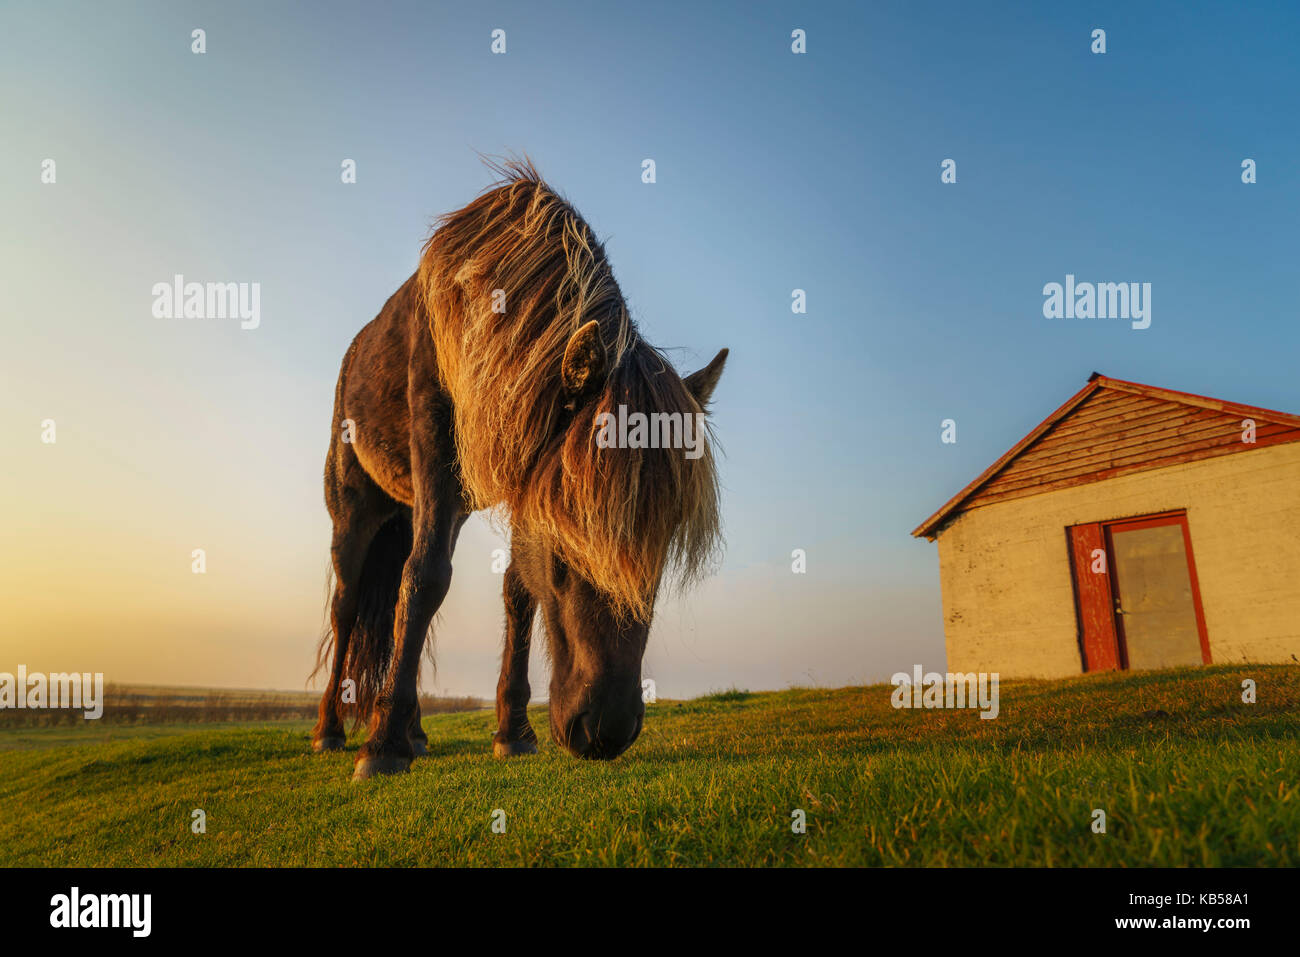 Icelandic Horse Grazing, Iceland Stock Photo